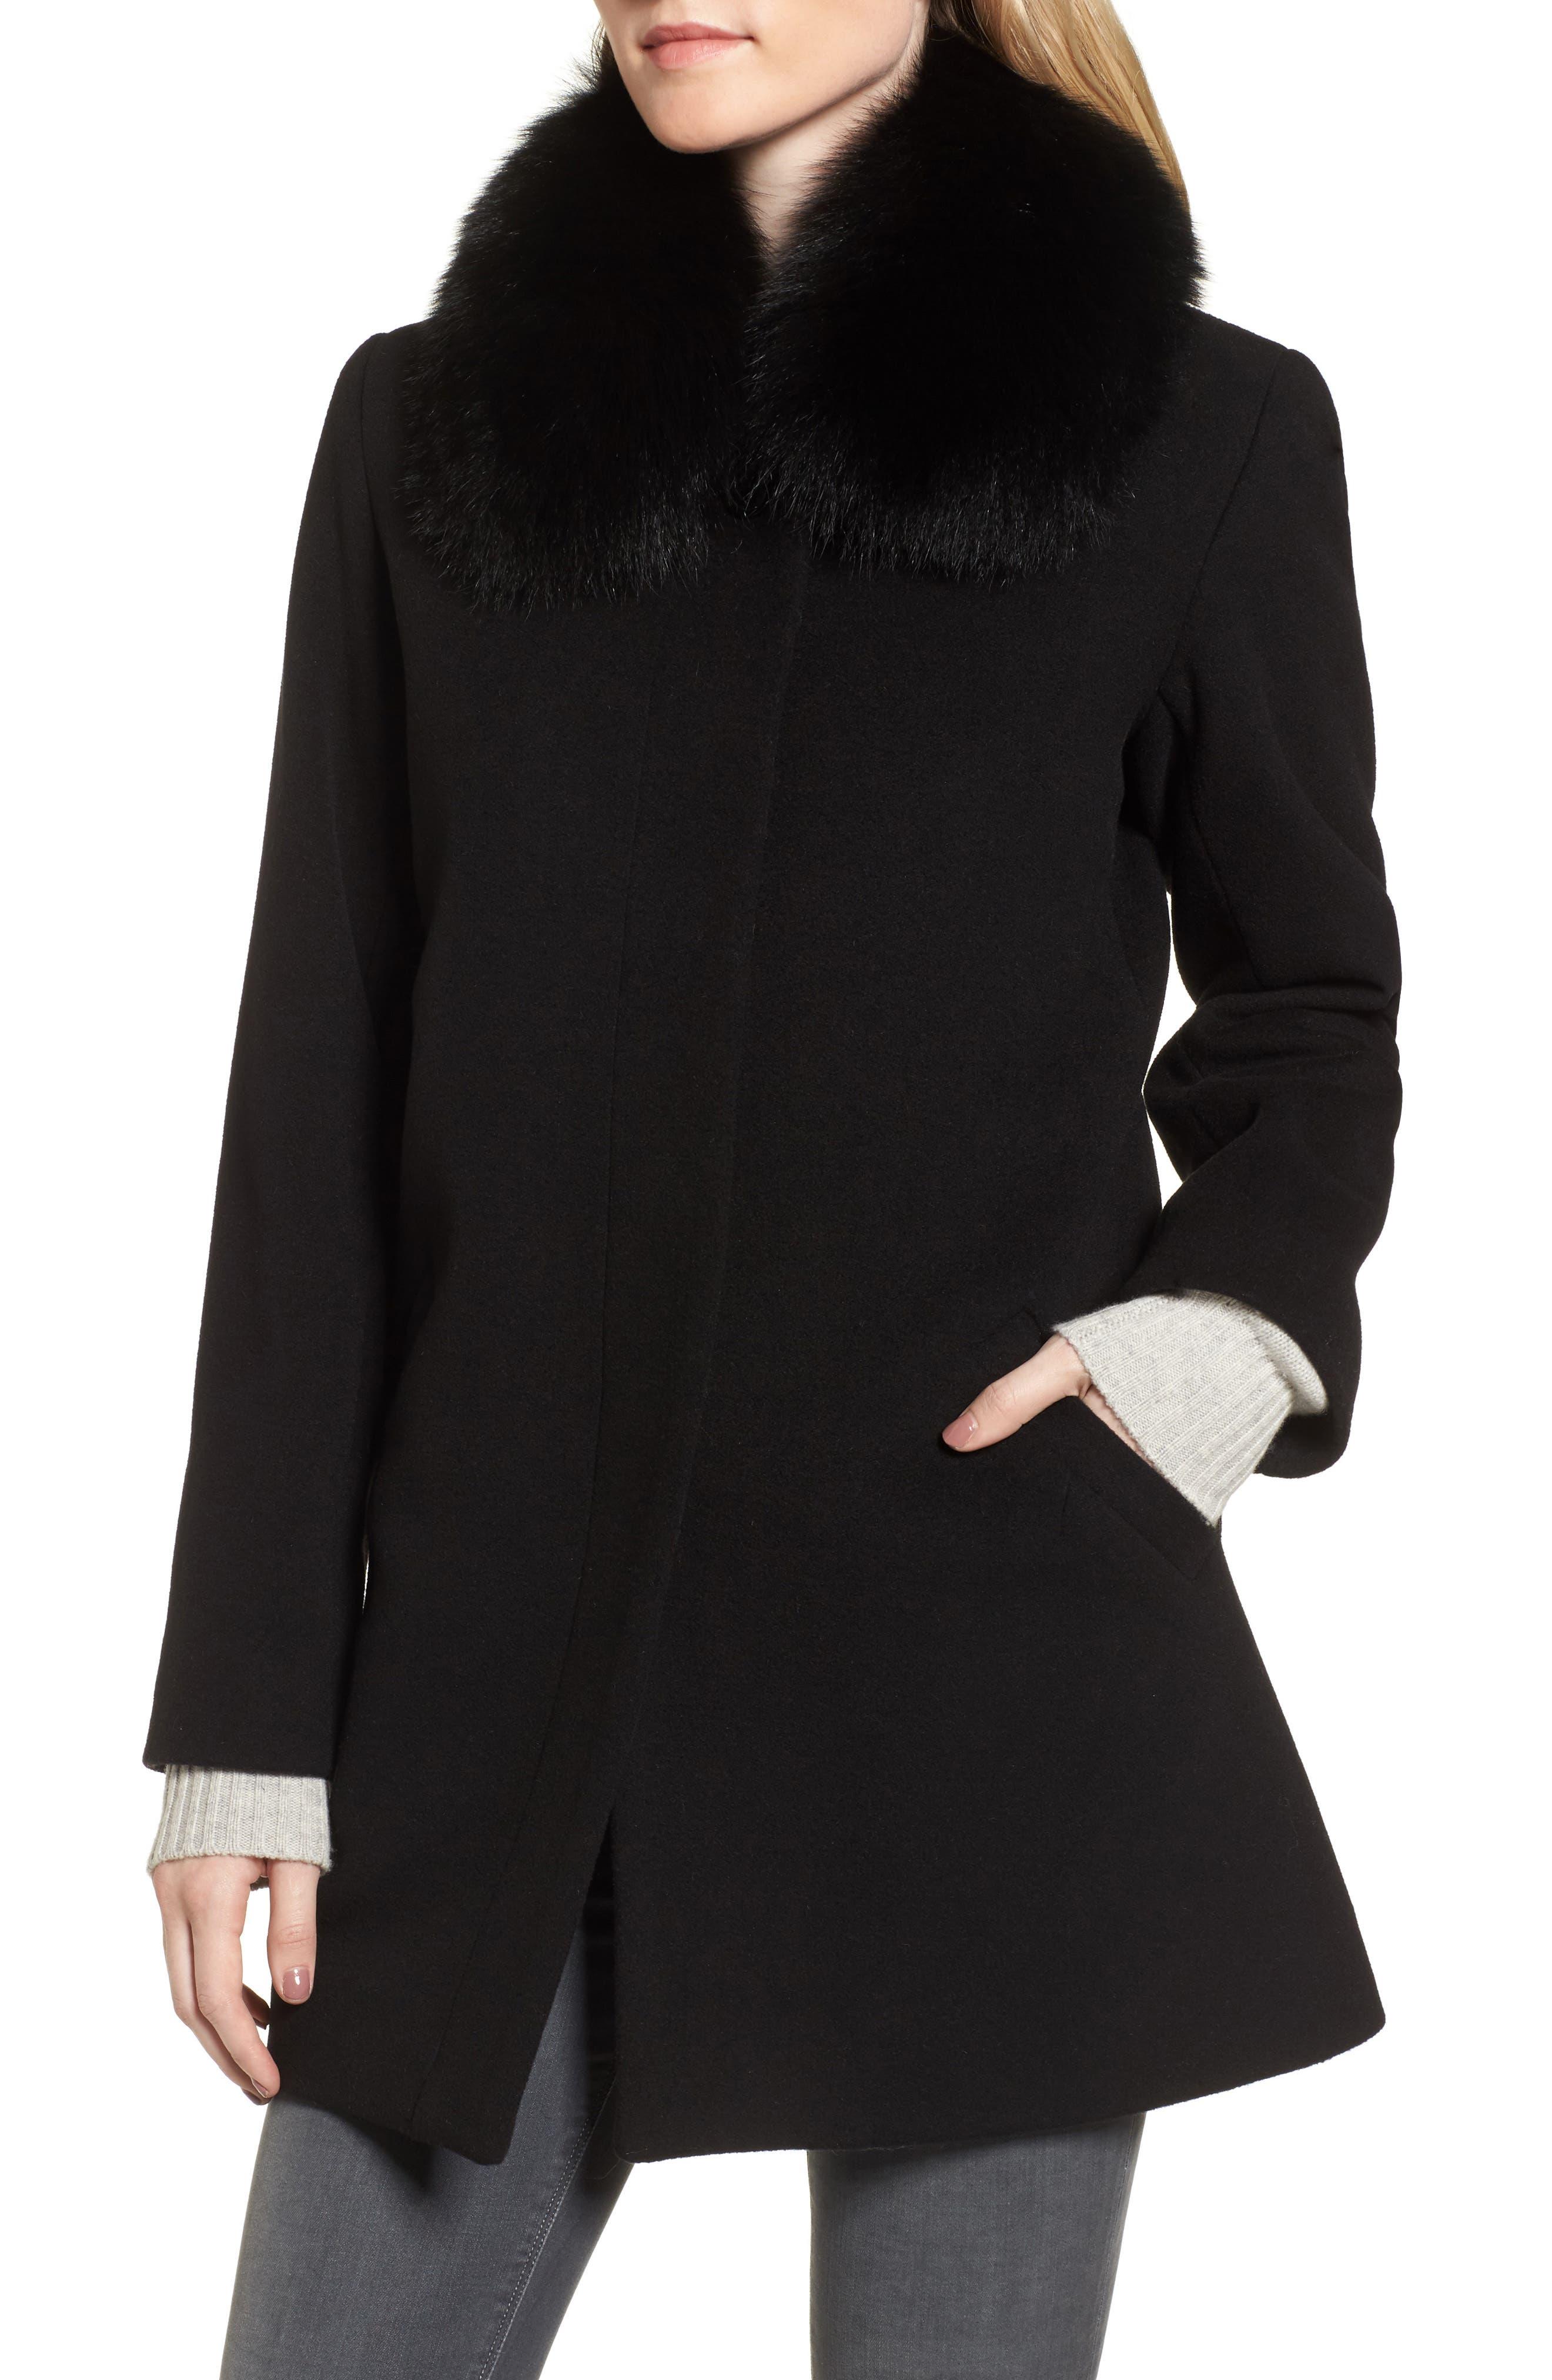 Sofia Cashmere Wool & Cashmere Car Coat with Genuine Fox Fur Club Collar